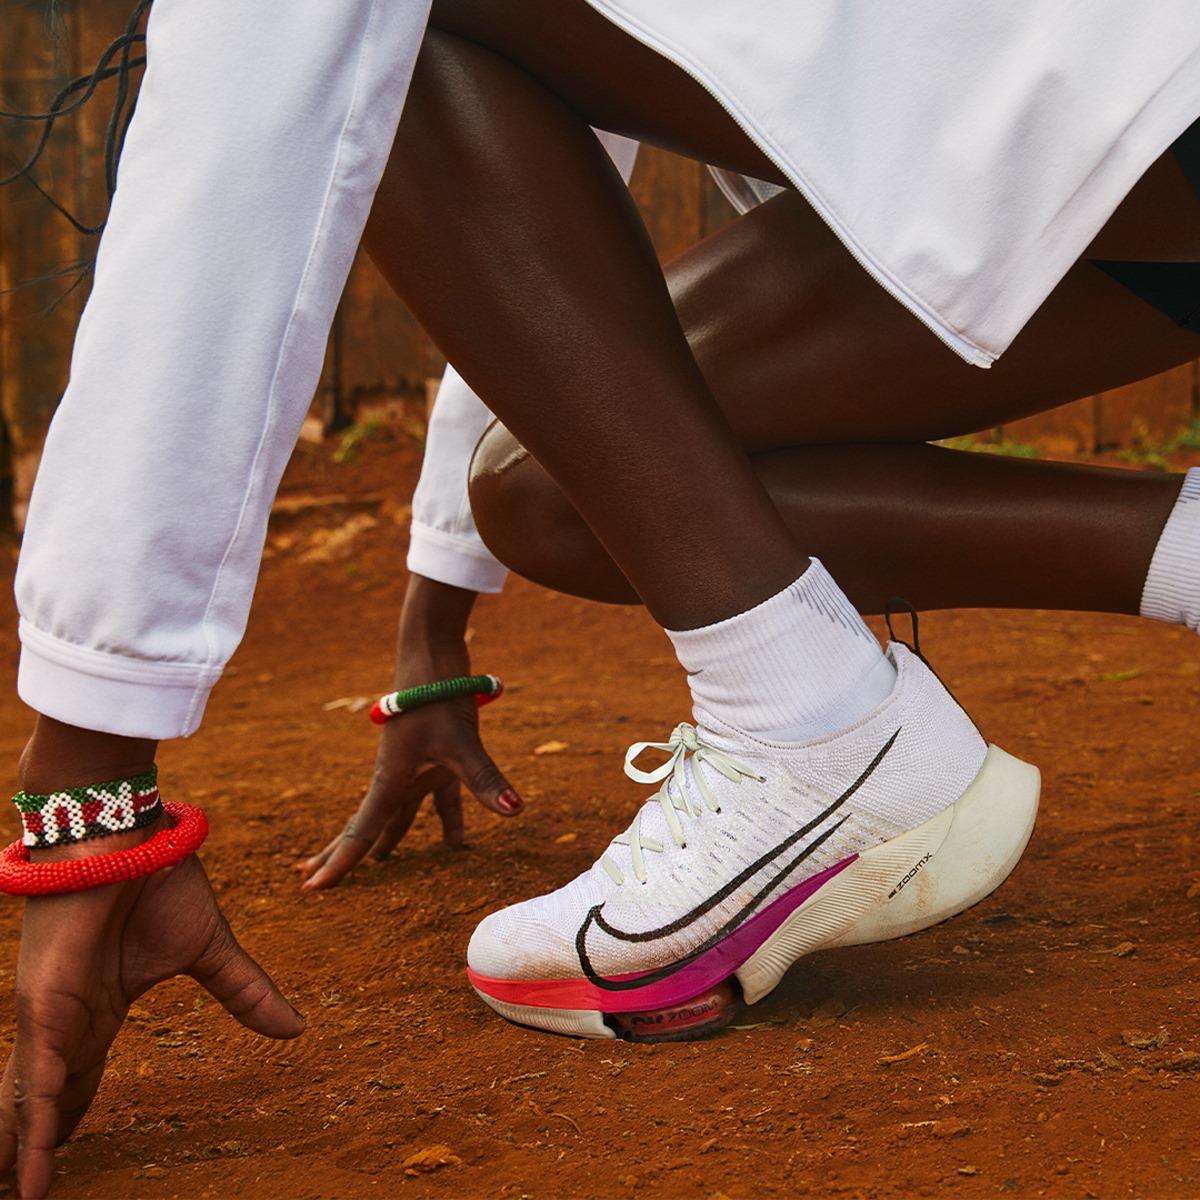 NIKE - Up To 15% Off Regular-Priced Footwear & Apparels